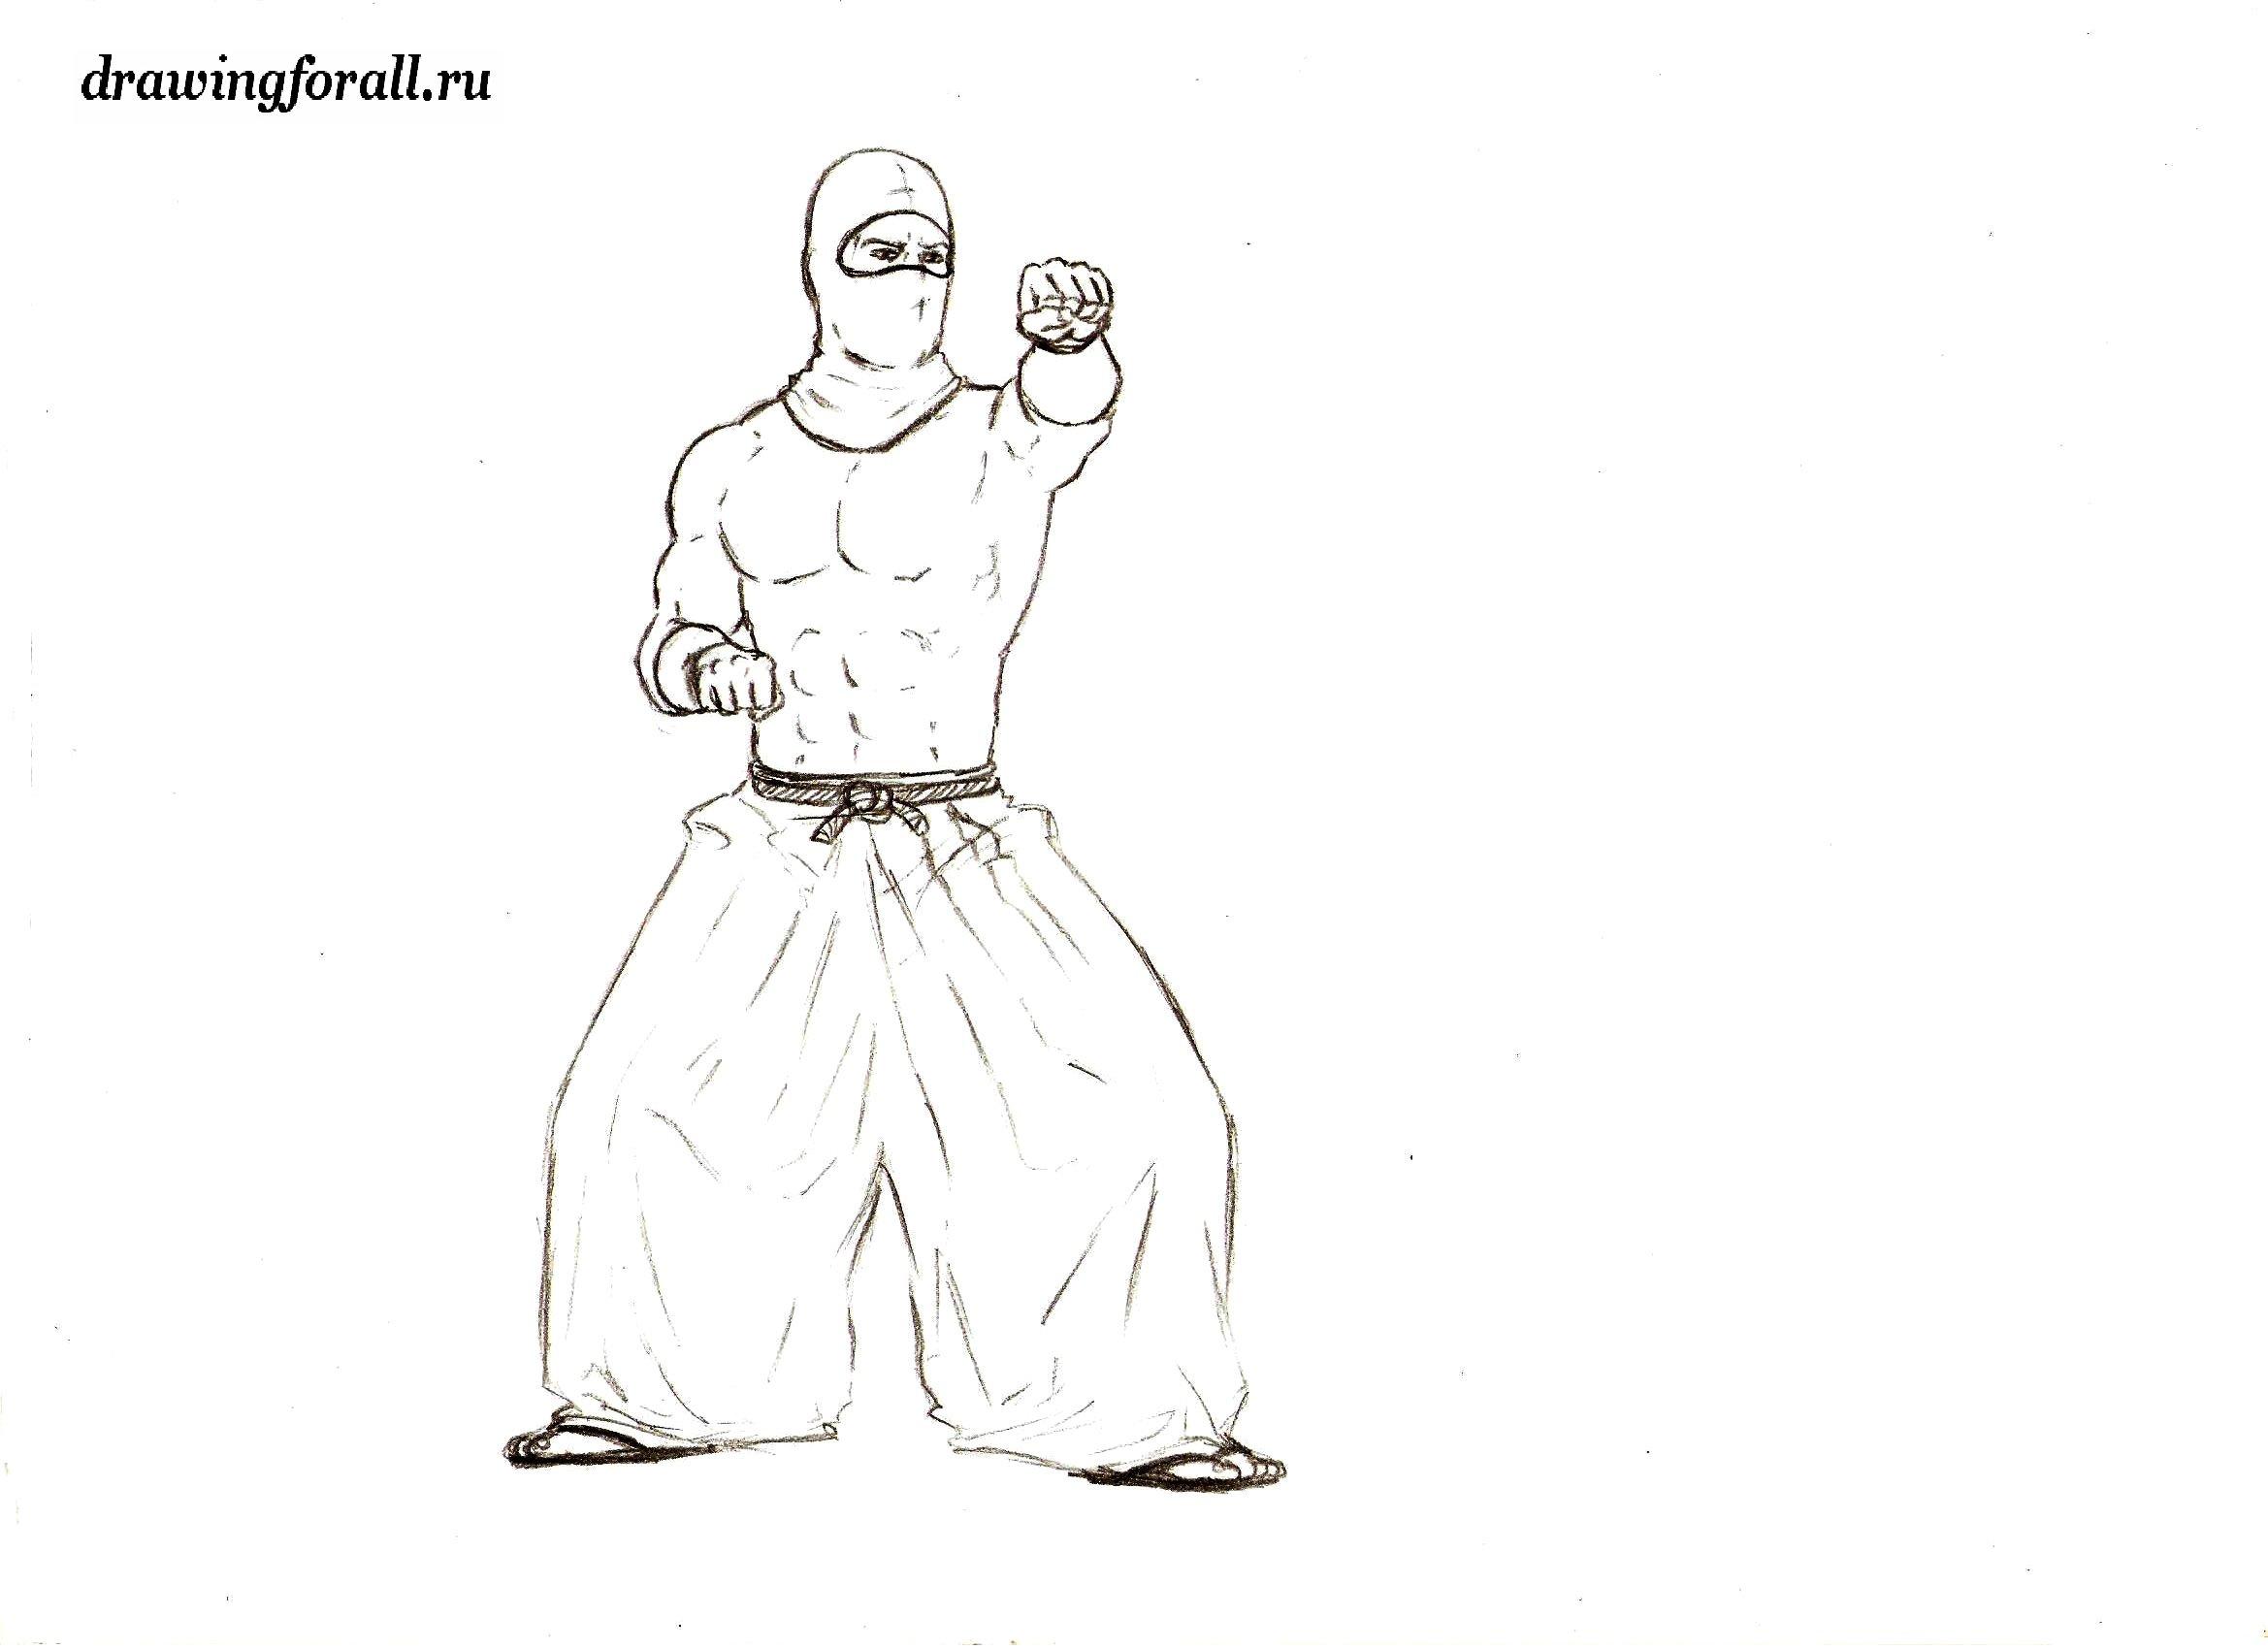 как нарисовать ниндзя поэтапно